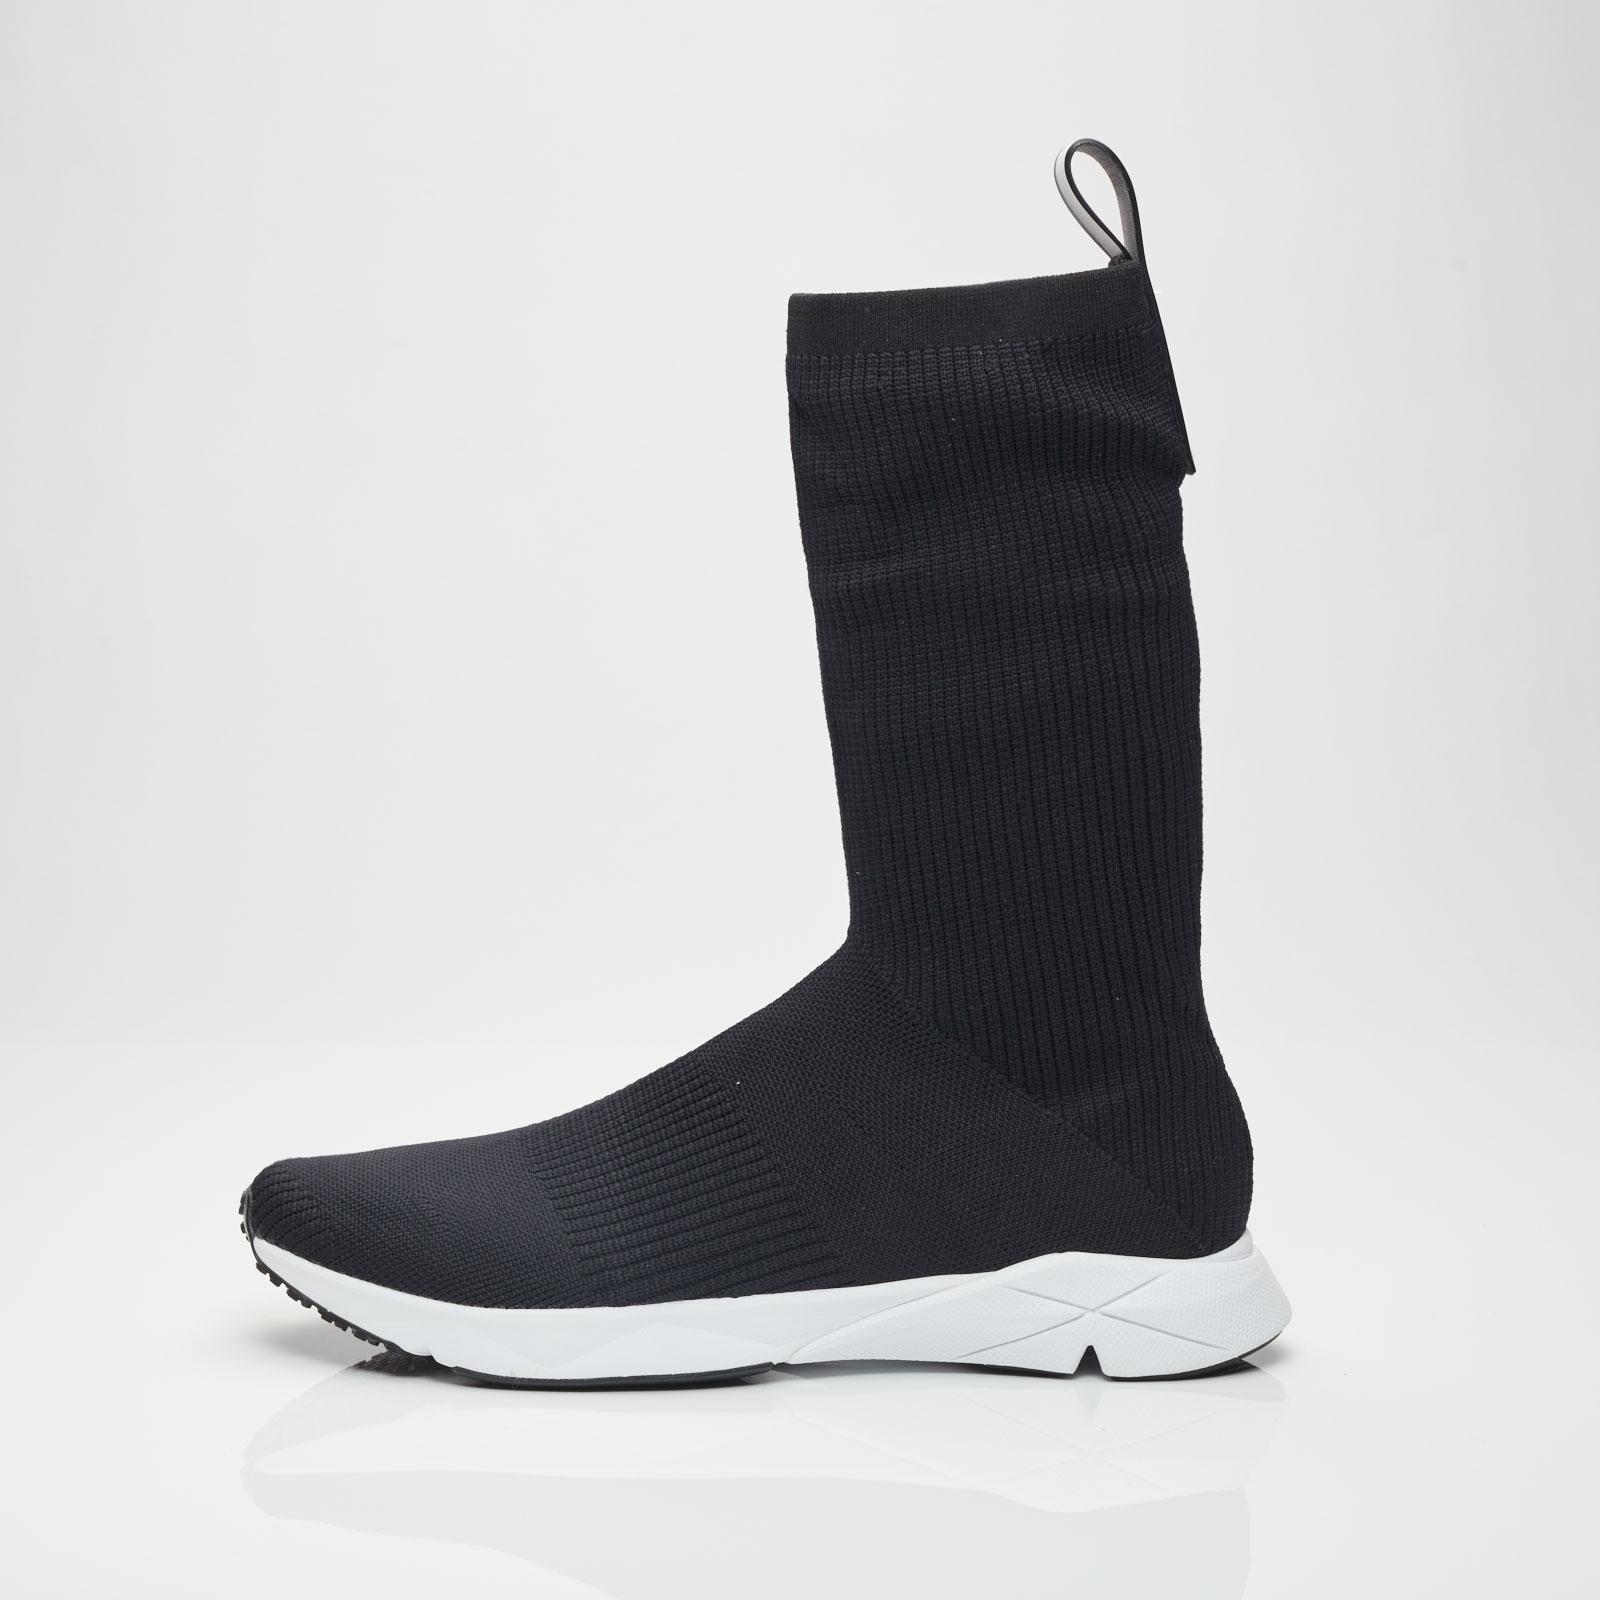 Reebok Sock Supreme Premium sneakers qae9w